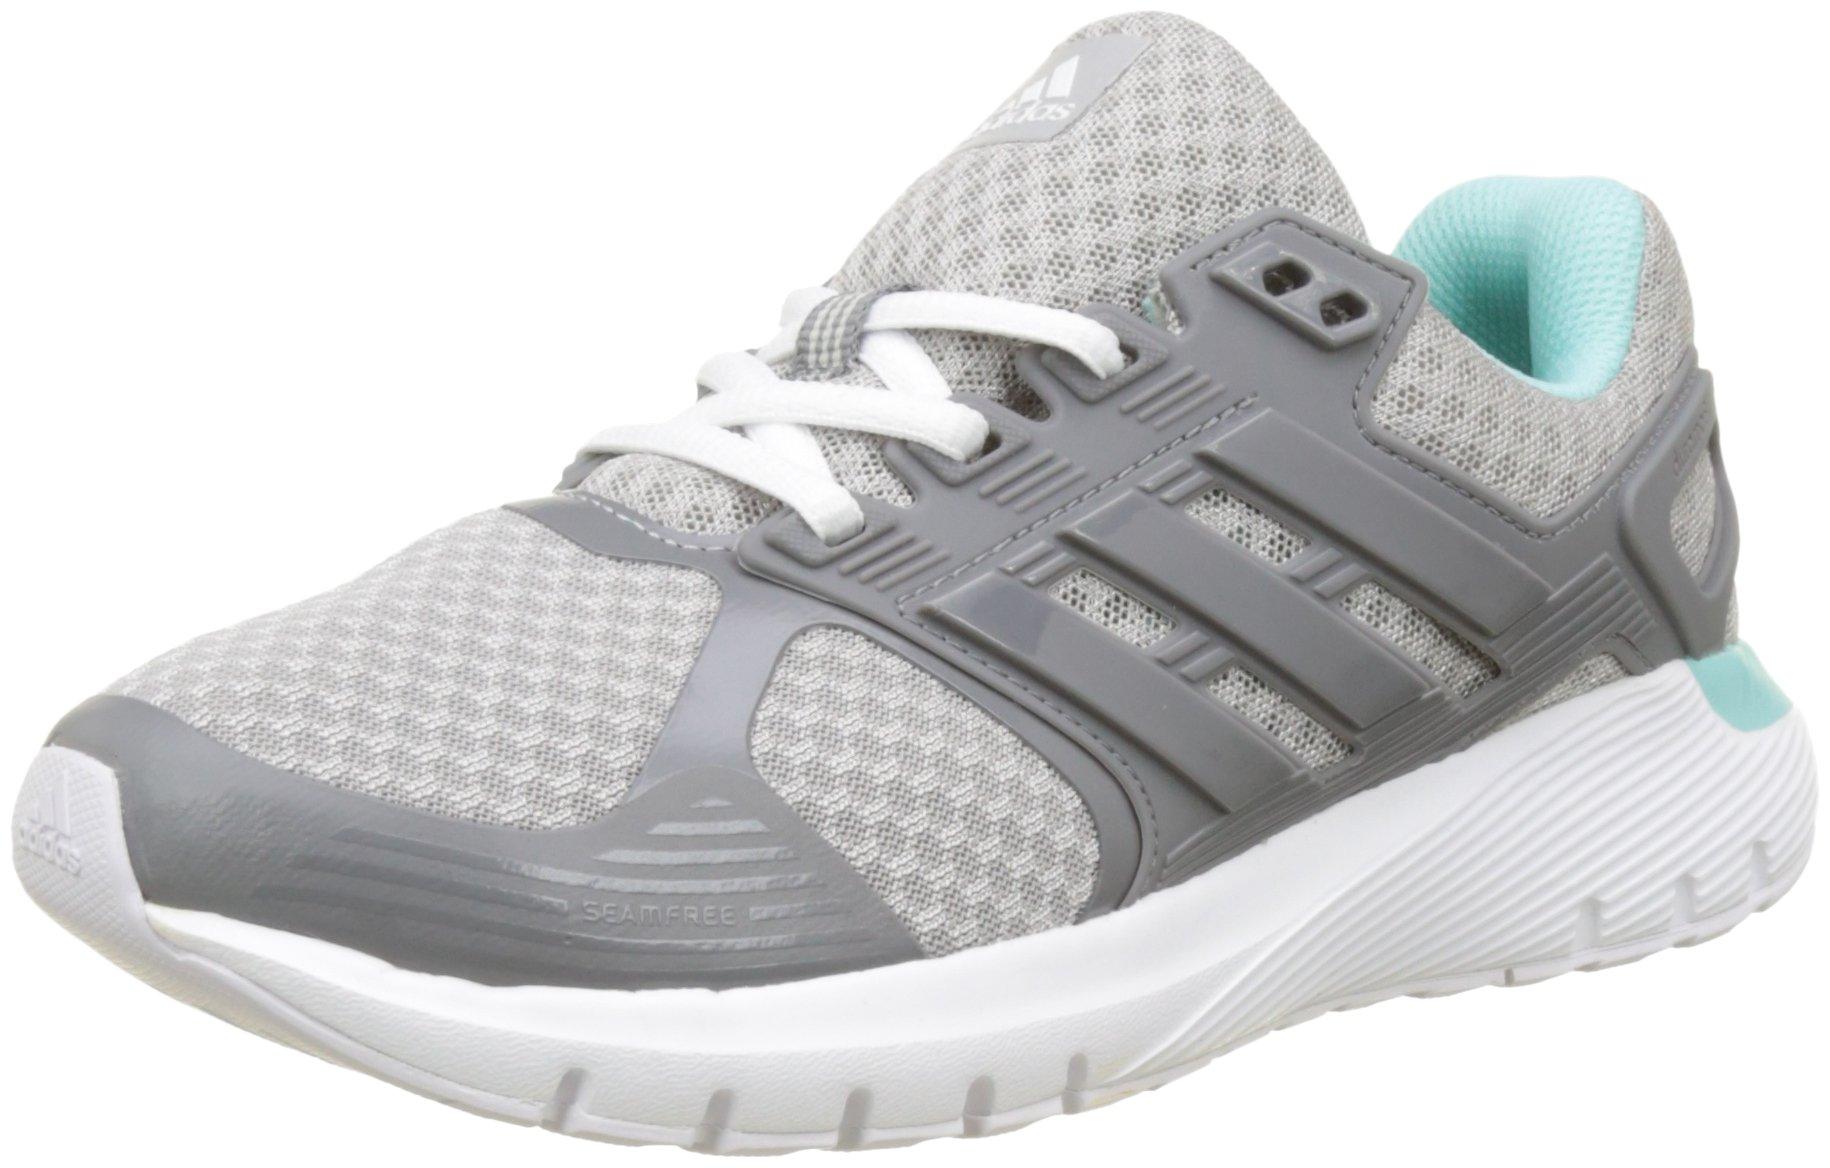 1 Running energy Two Aqua37 8Chaussures De FemmeGris Three 3 Adidas Duramo Eu Entrainement grey mwN8Ovn0